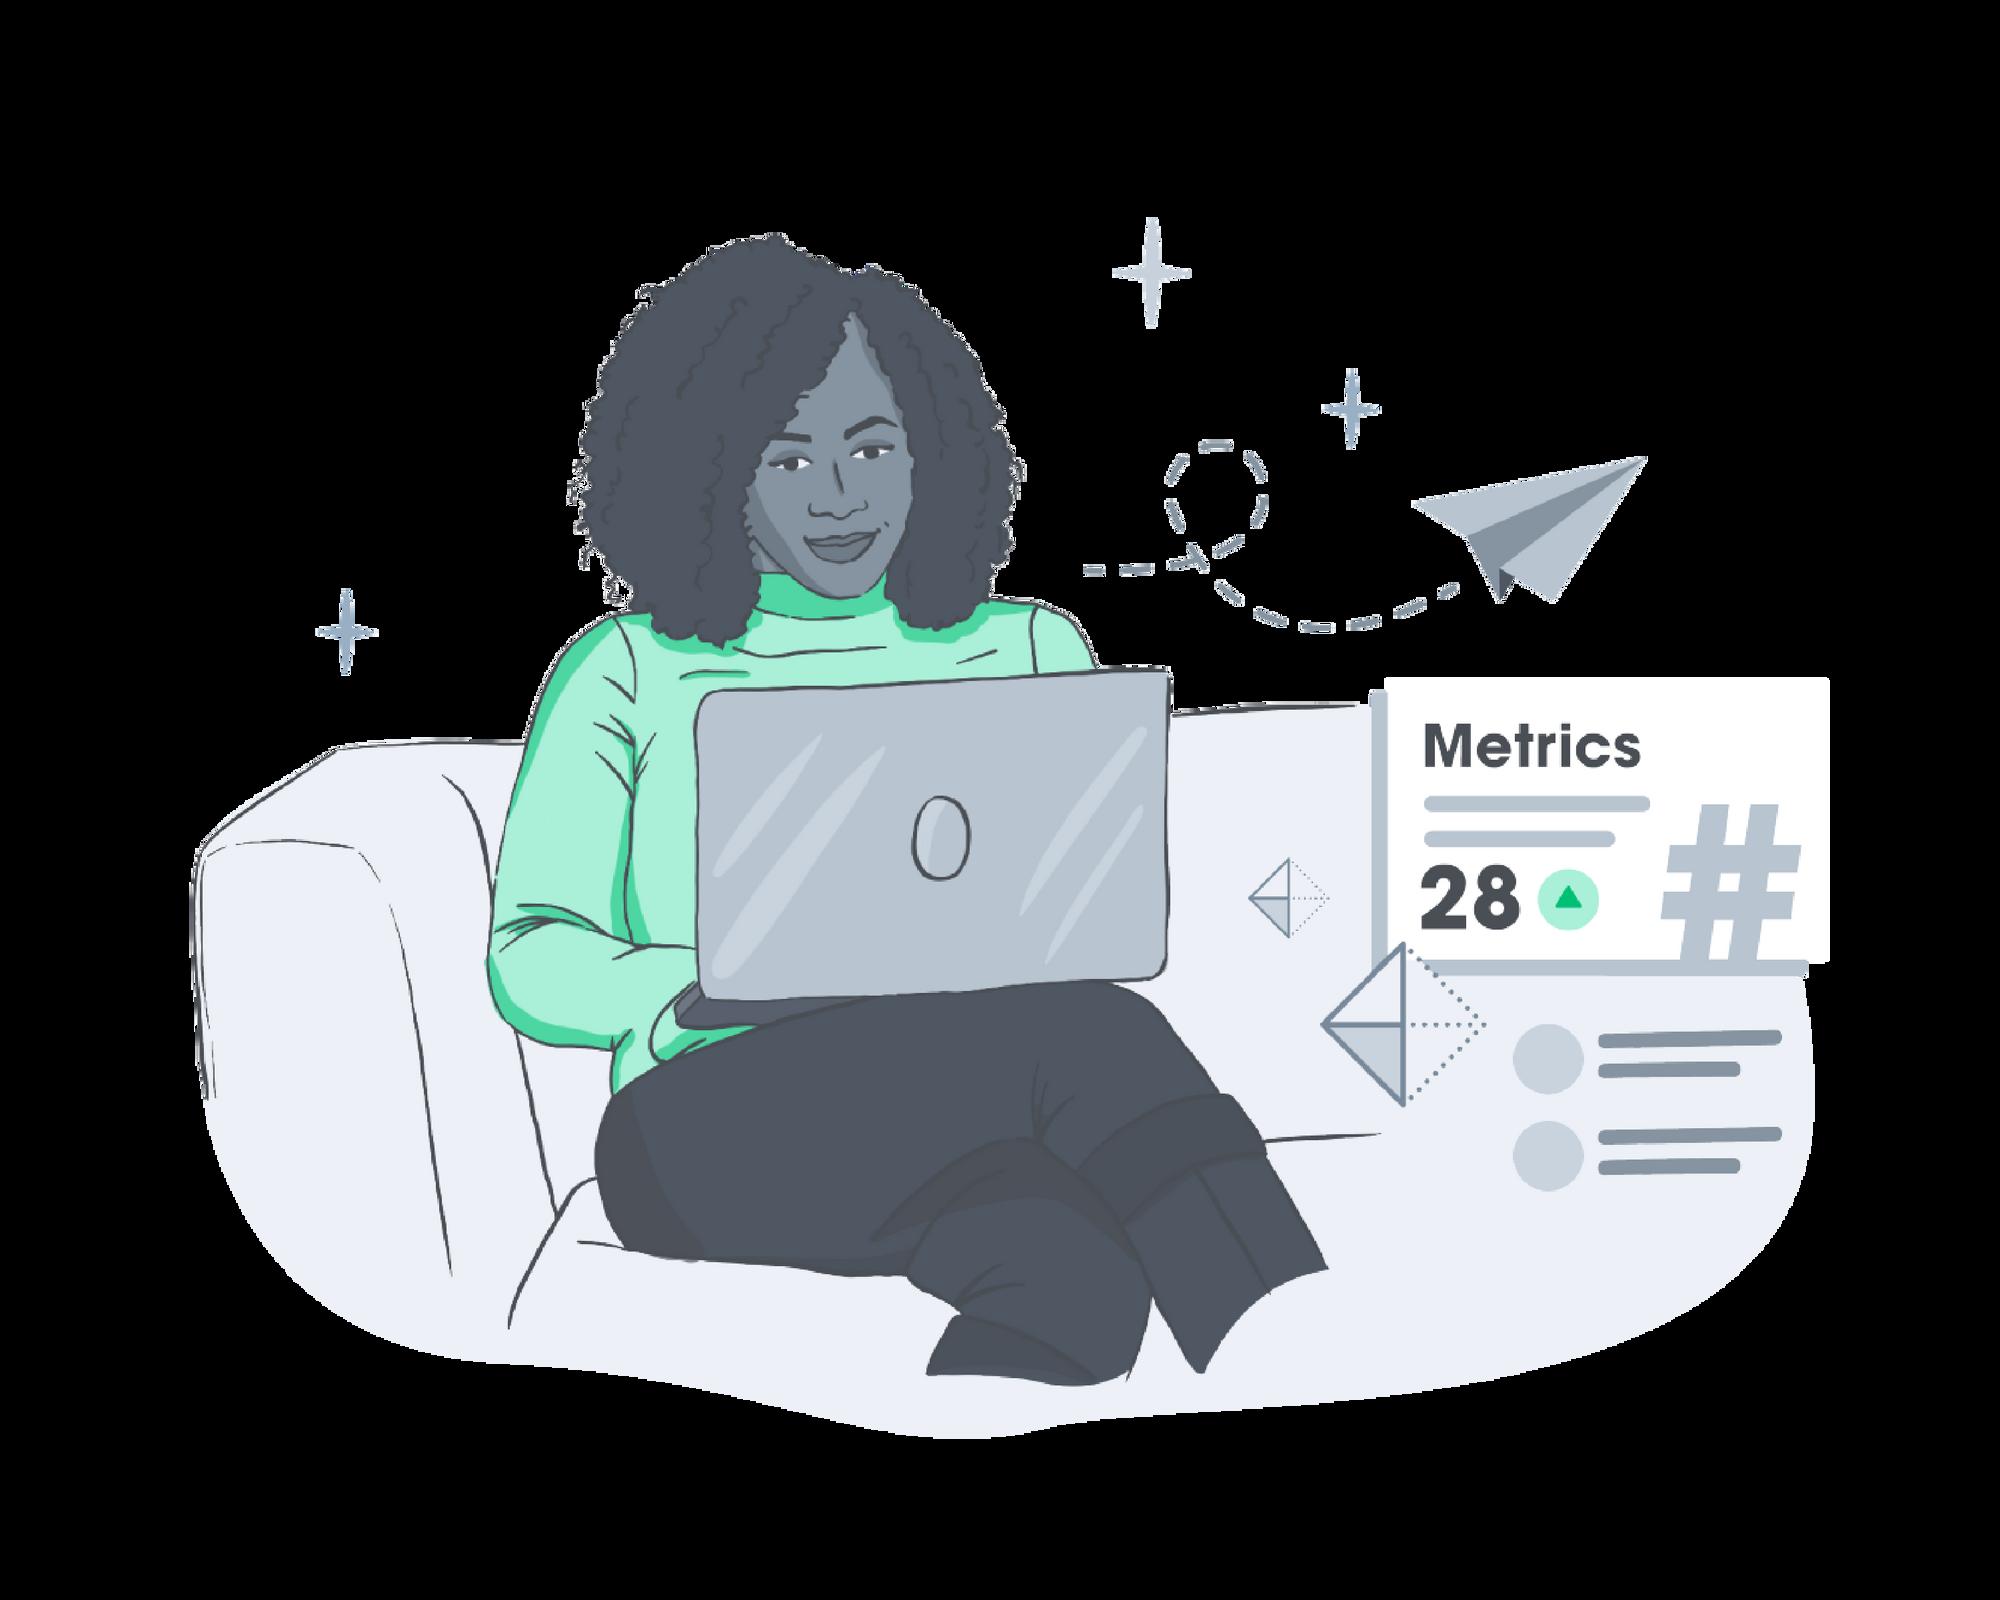 Data & Metrics